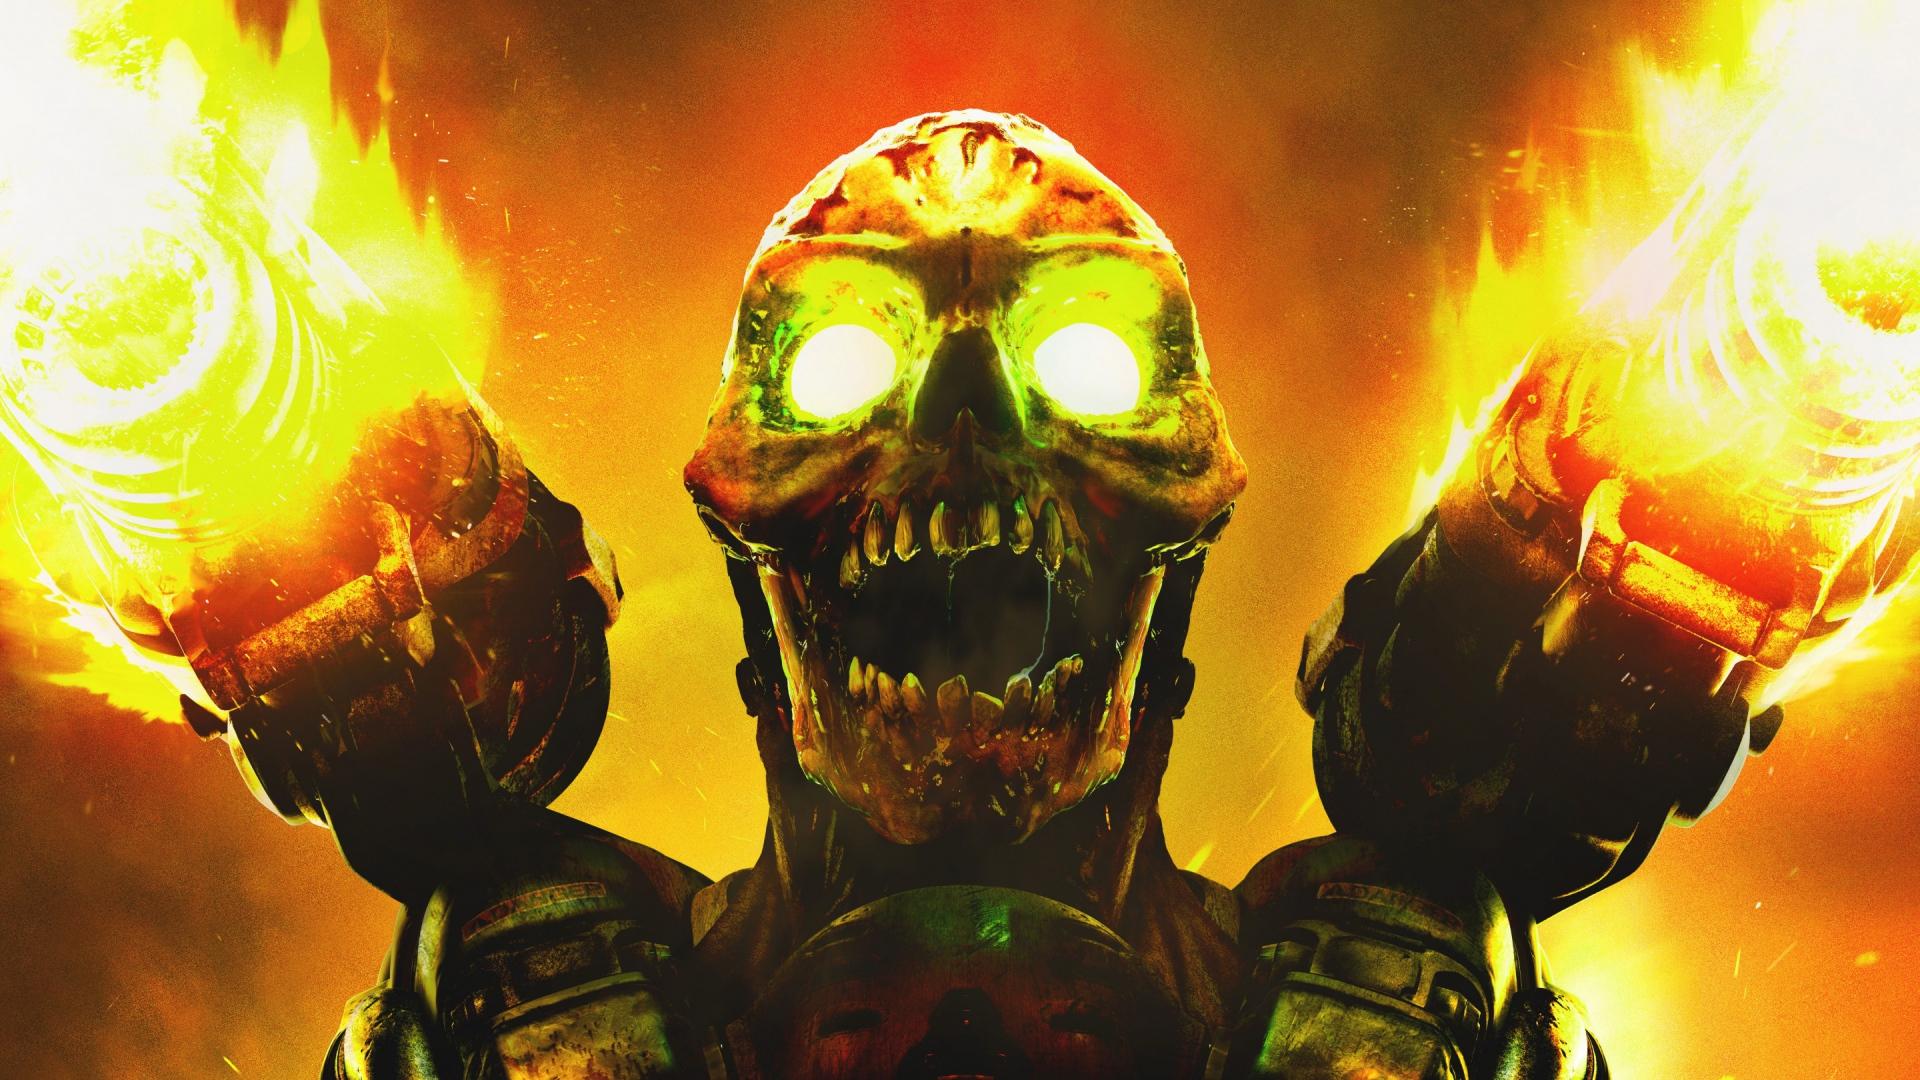 2048x1152 wallpaper free fire: Doom Fond D'écran HD